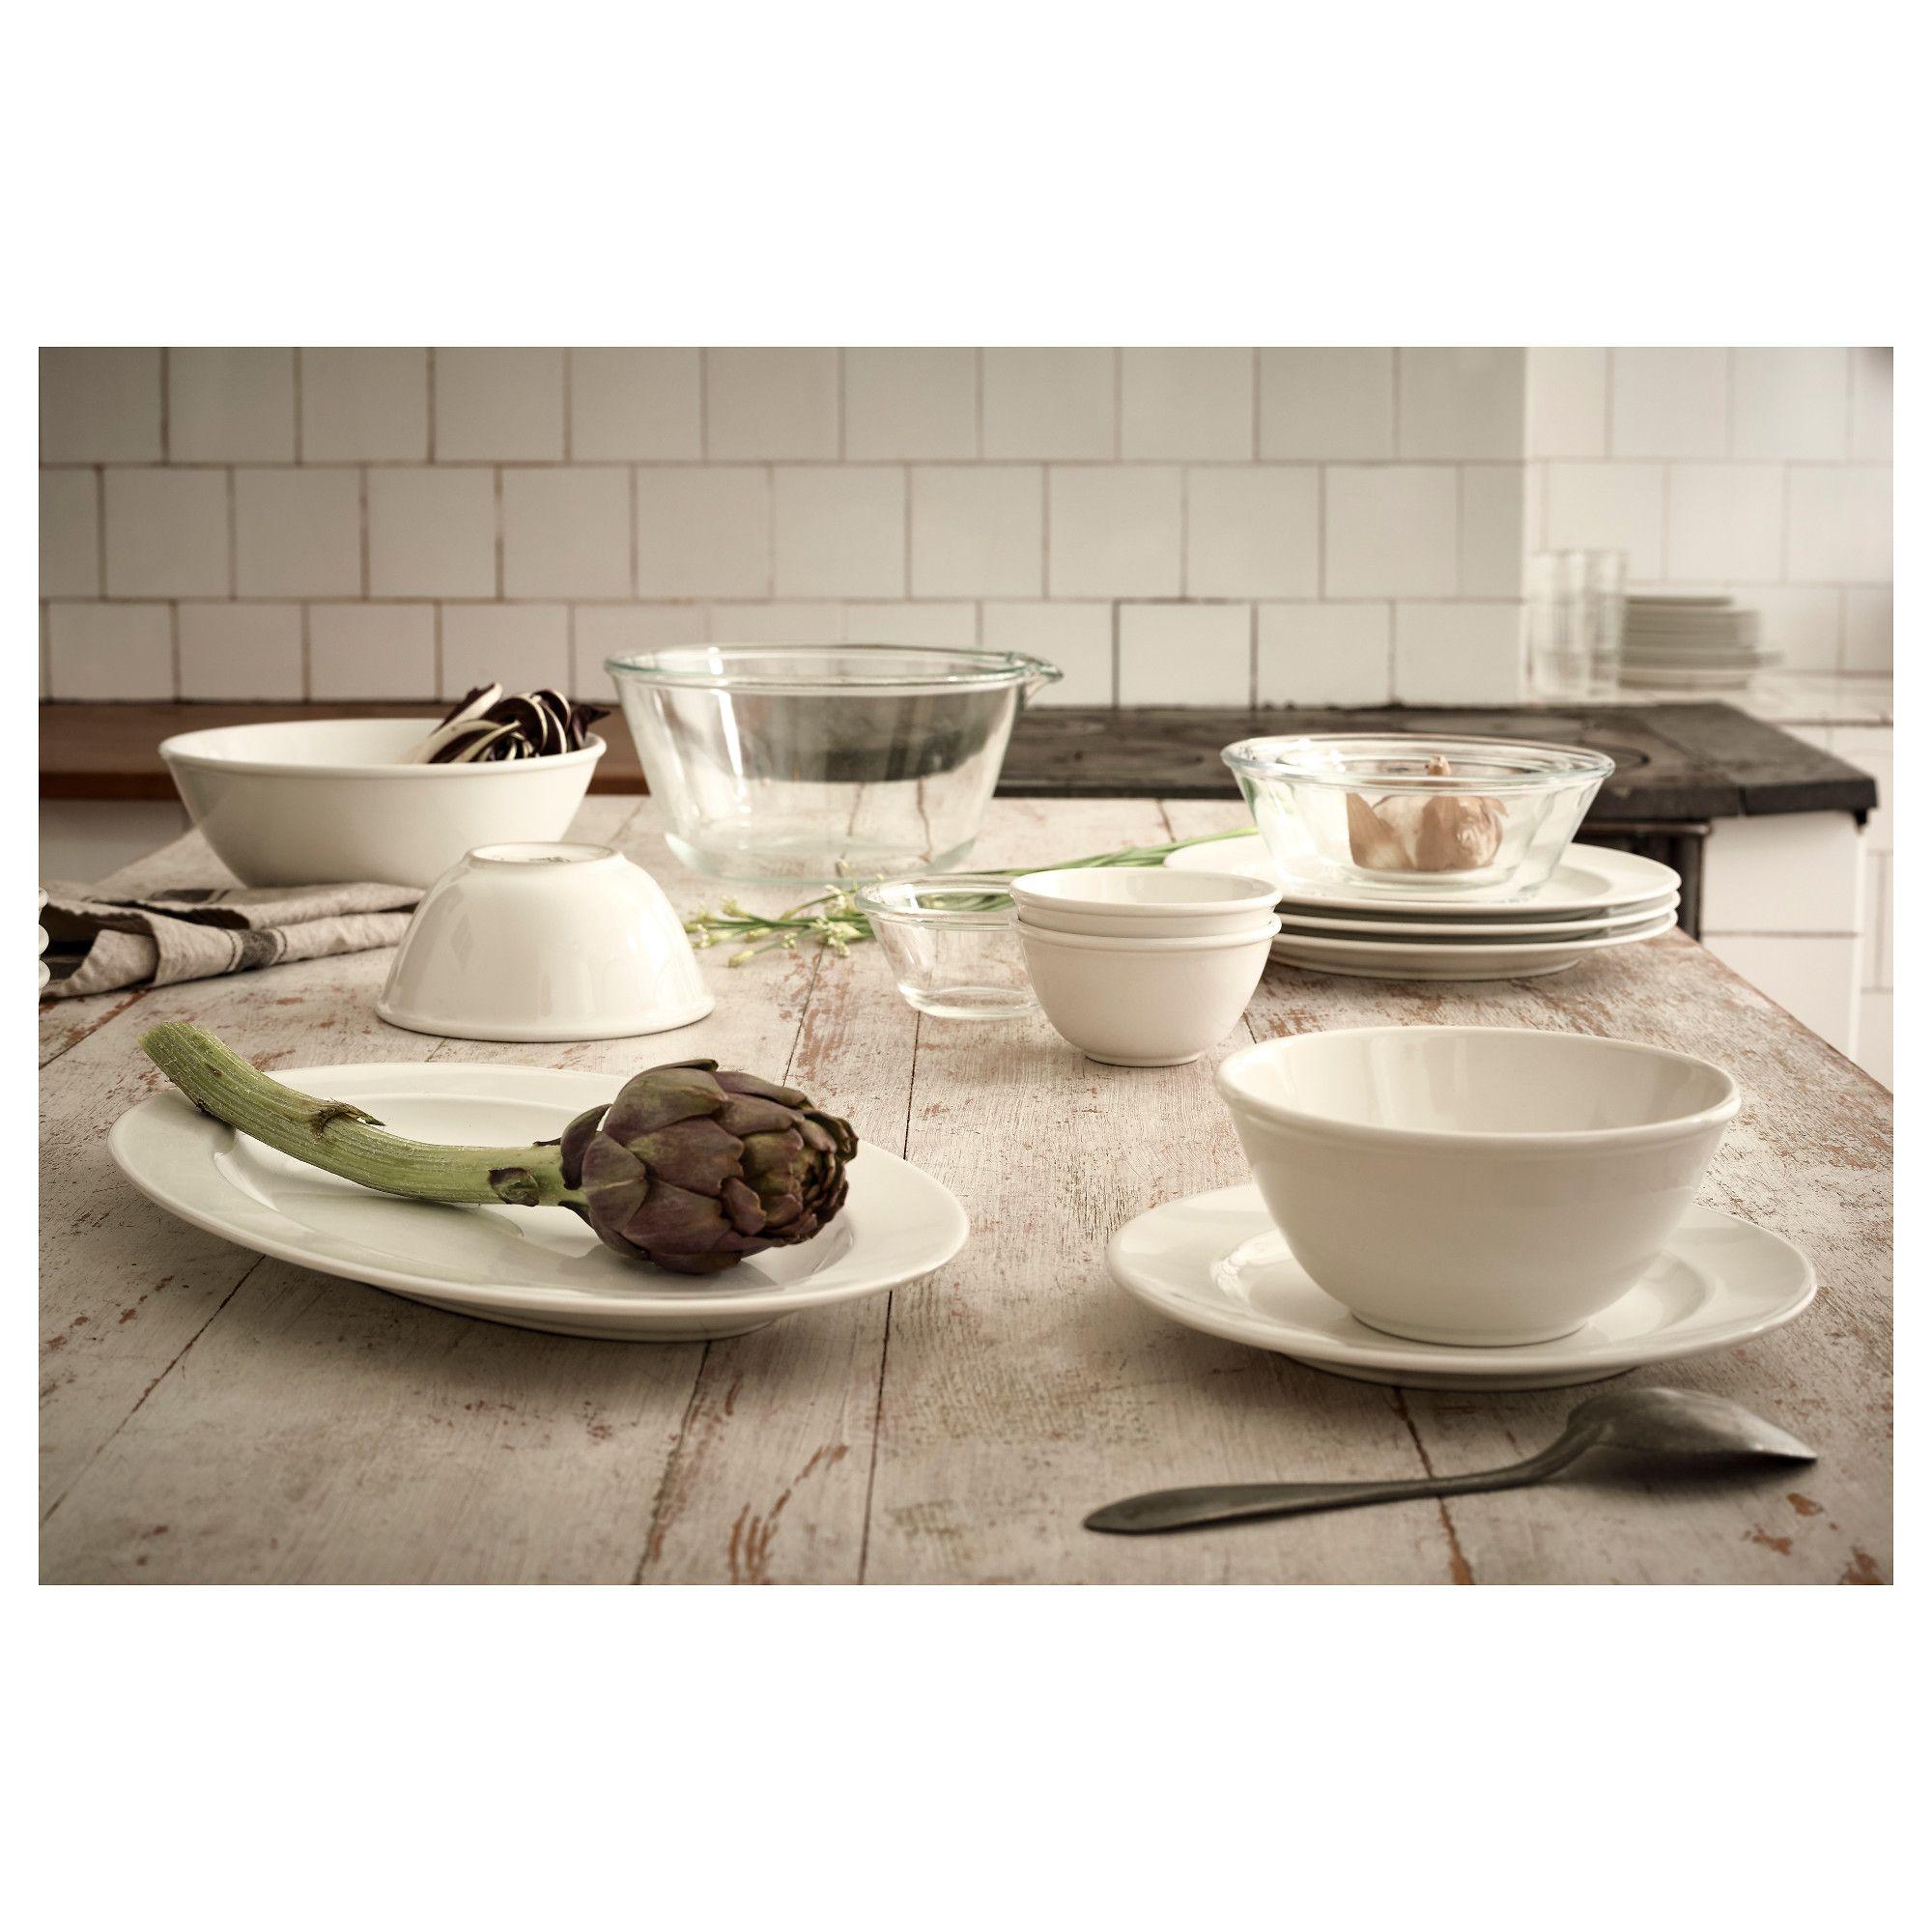 Ikea Usa All Products: IKEA - VARDAGEN Bowl Clear Glass